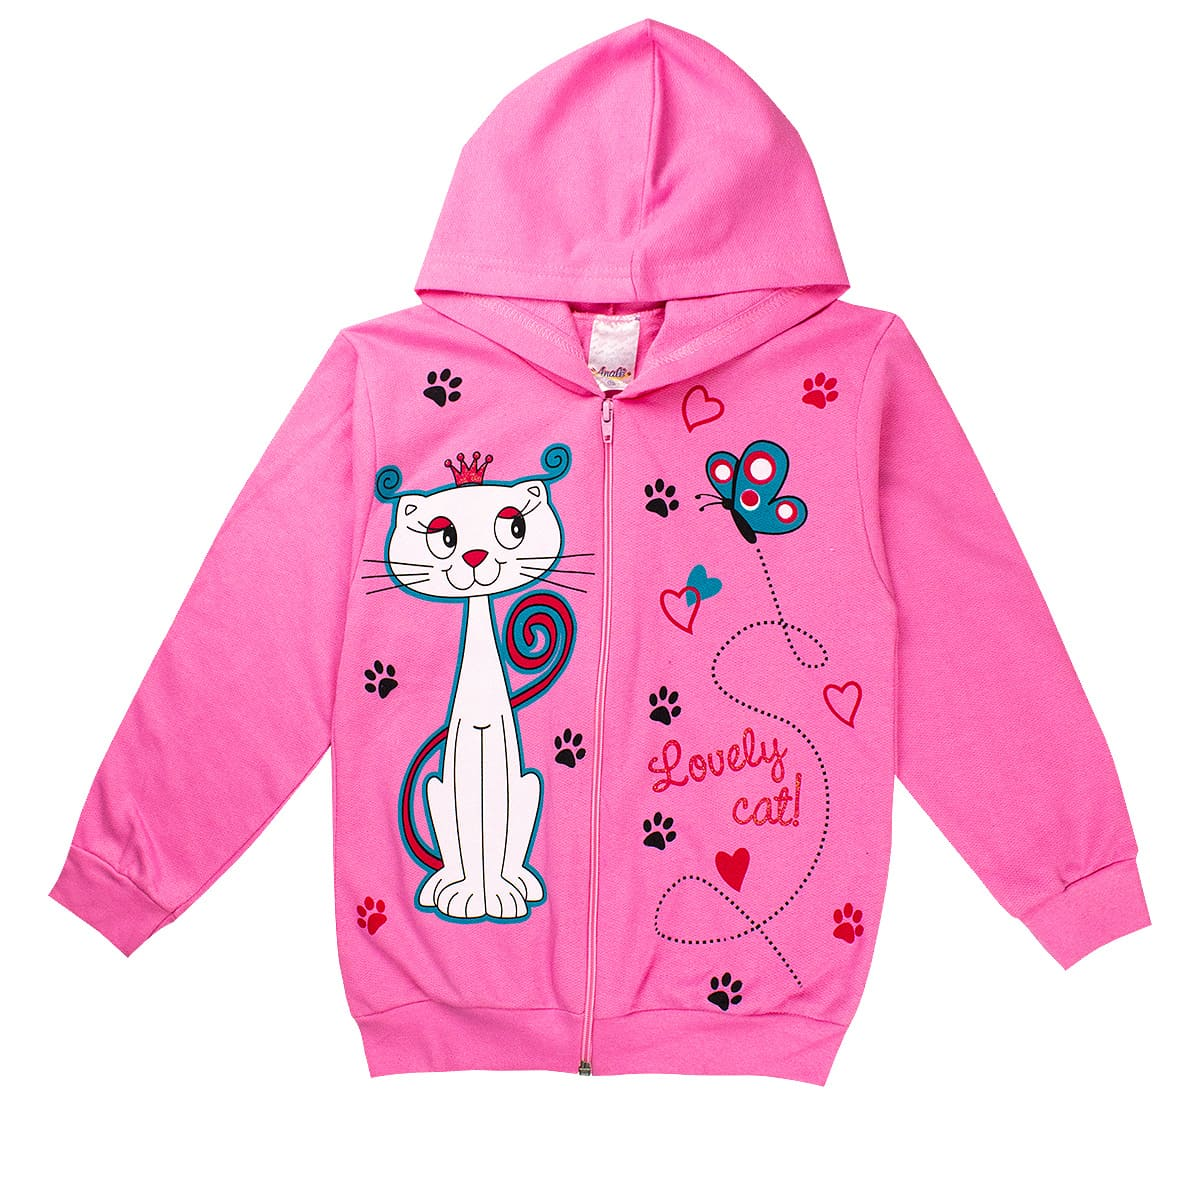 Jaqueta Infantil Feminina Love Cat Rosa Analê